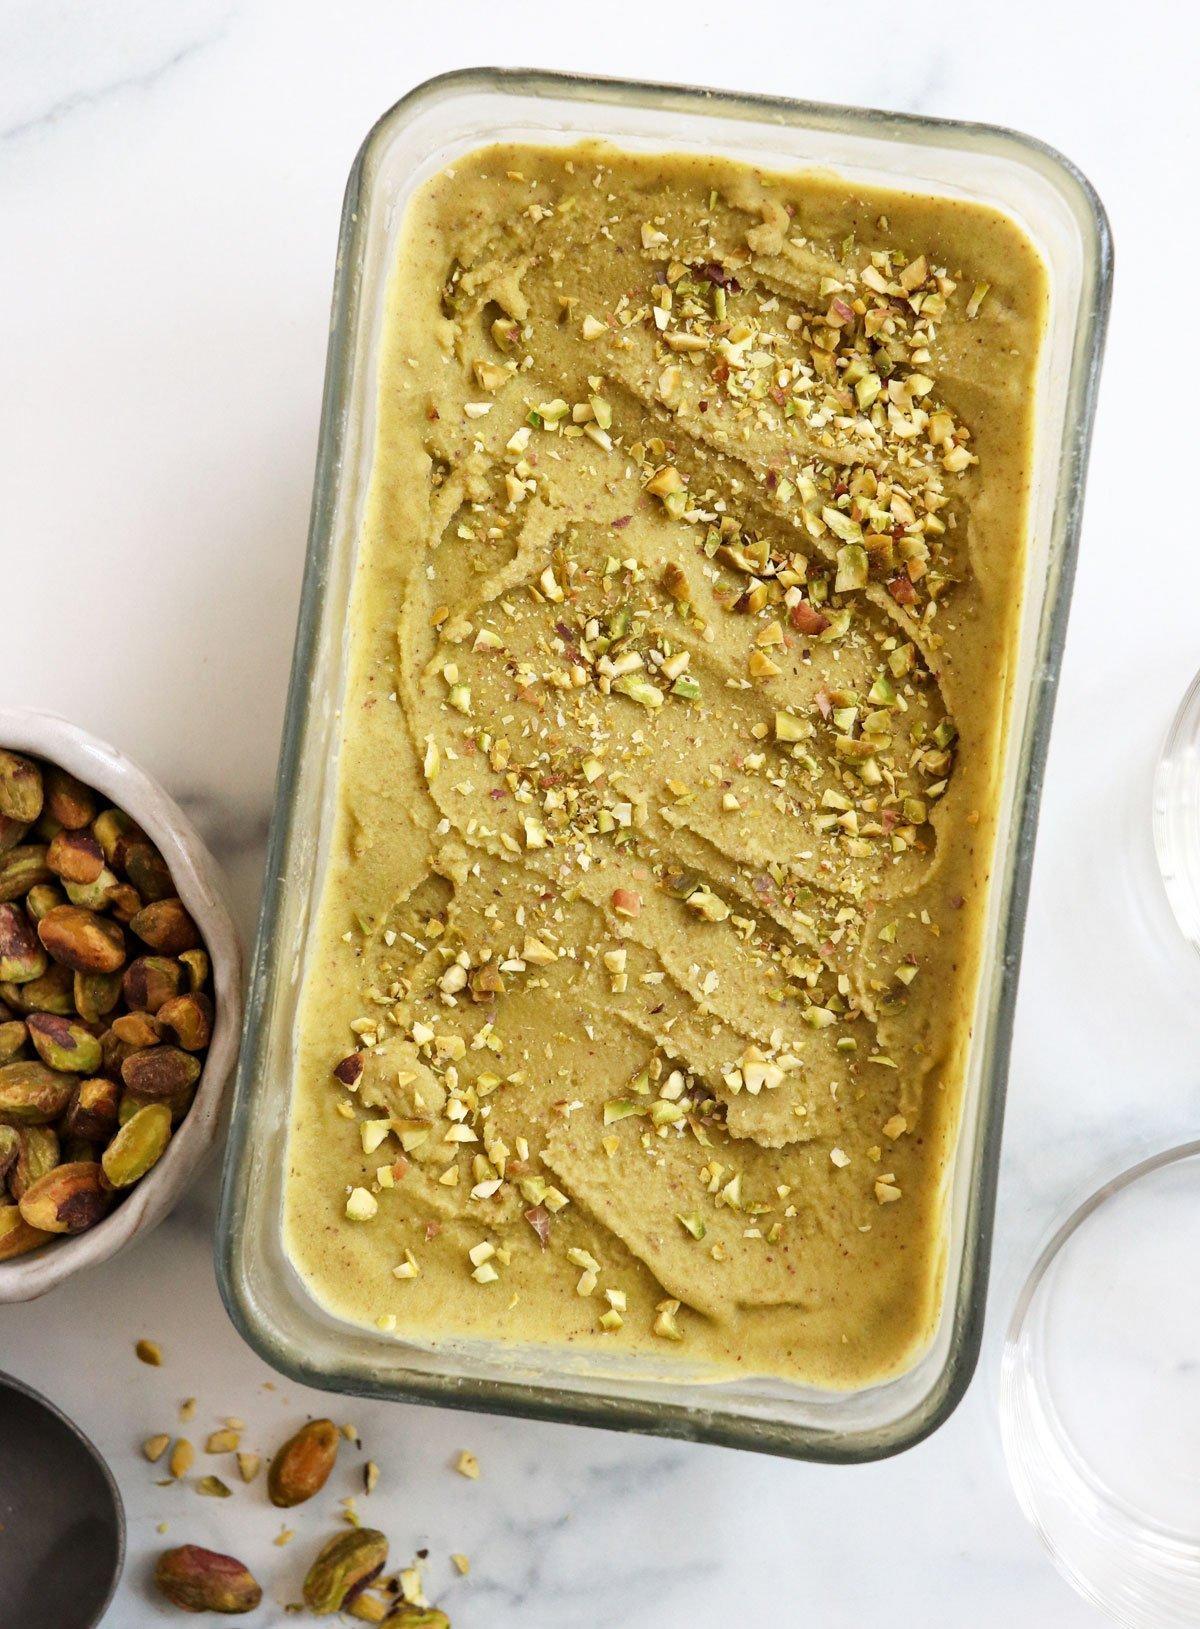 pistachio ice cream in loaf pan